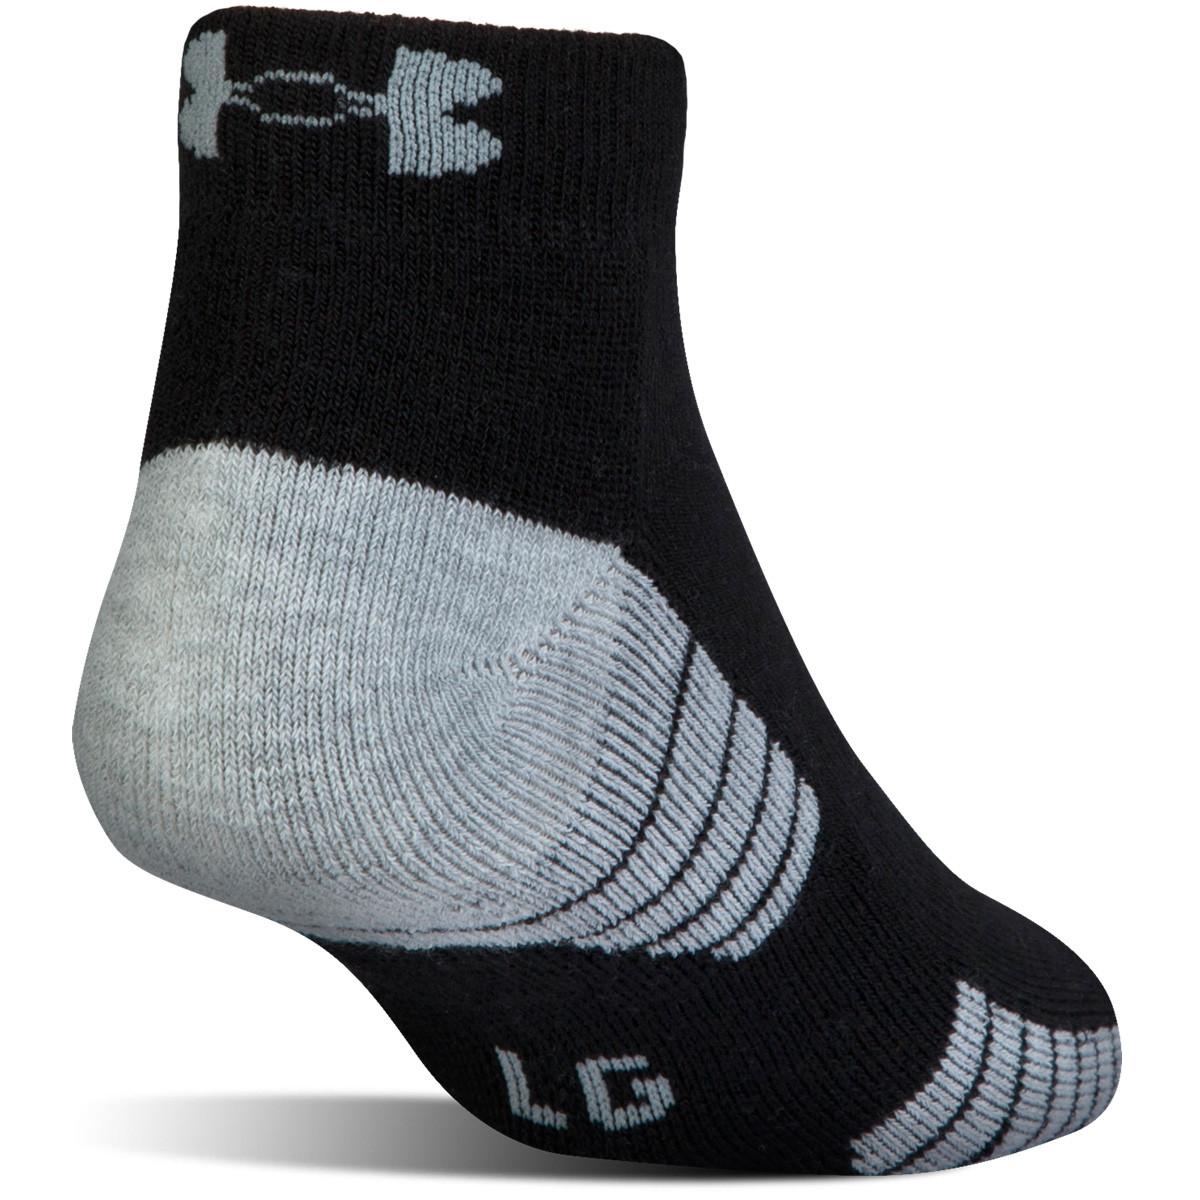 Under Armour Men/'s Heatgear Tech Lo Cut Socks 3 Pack Choose SZ//Color